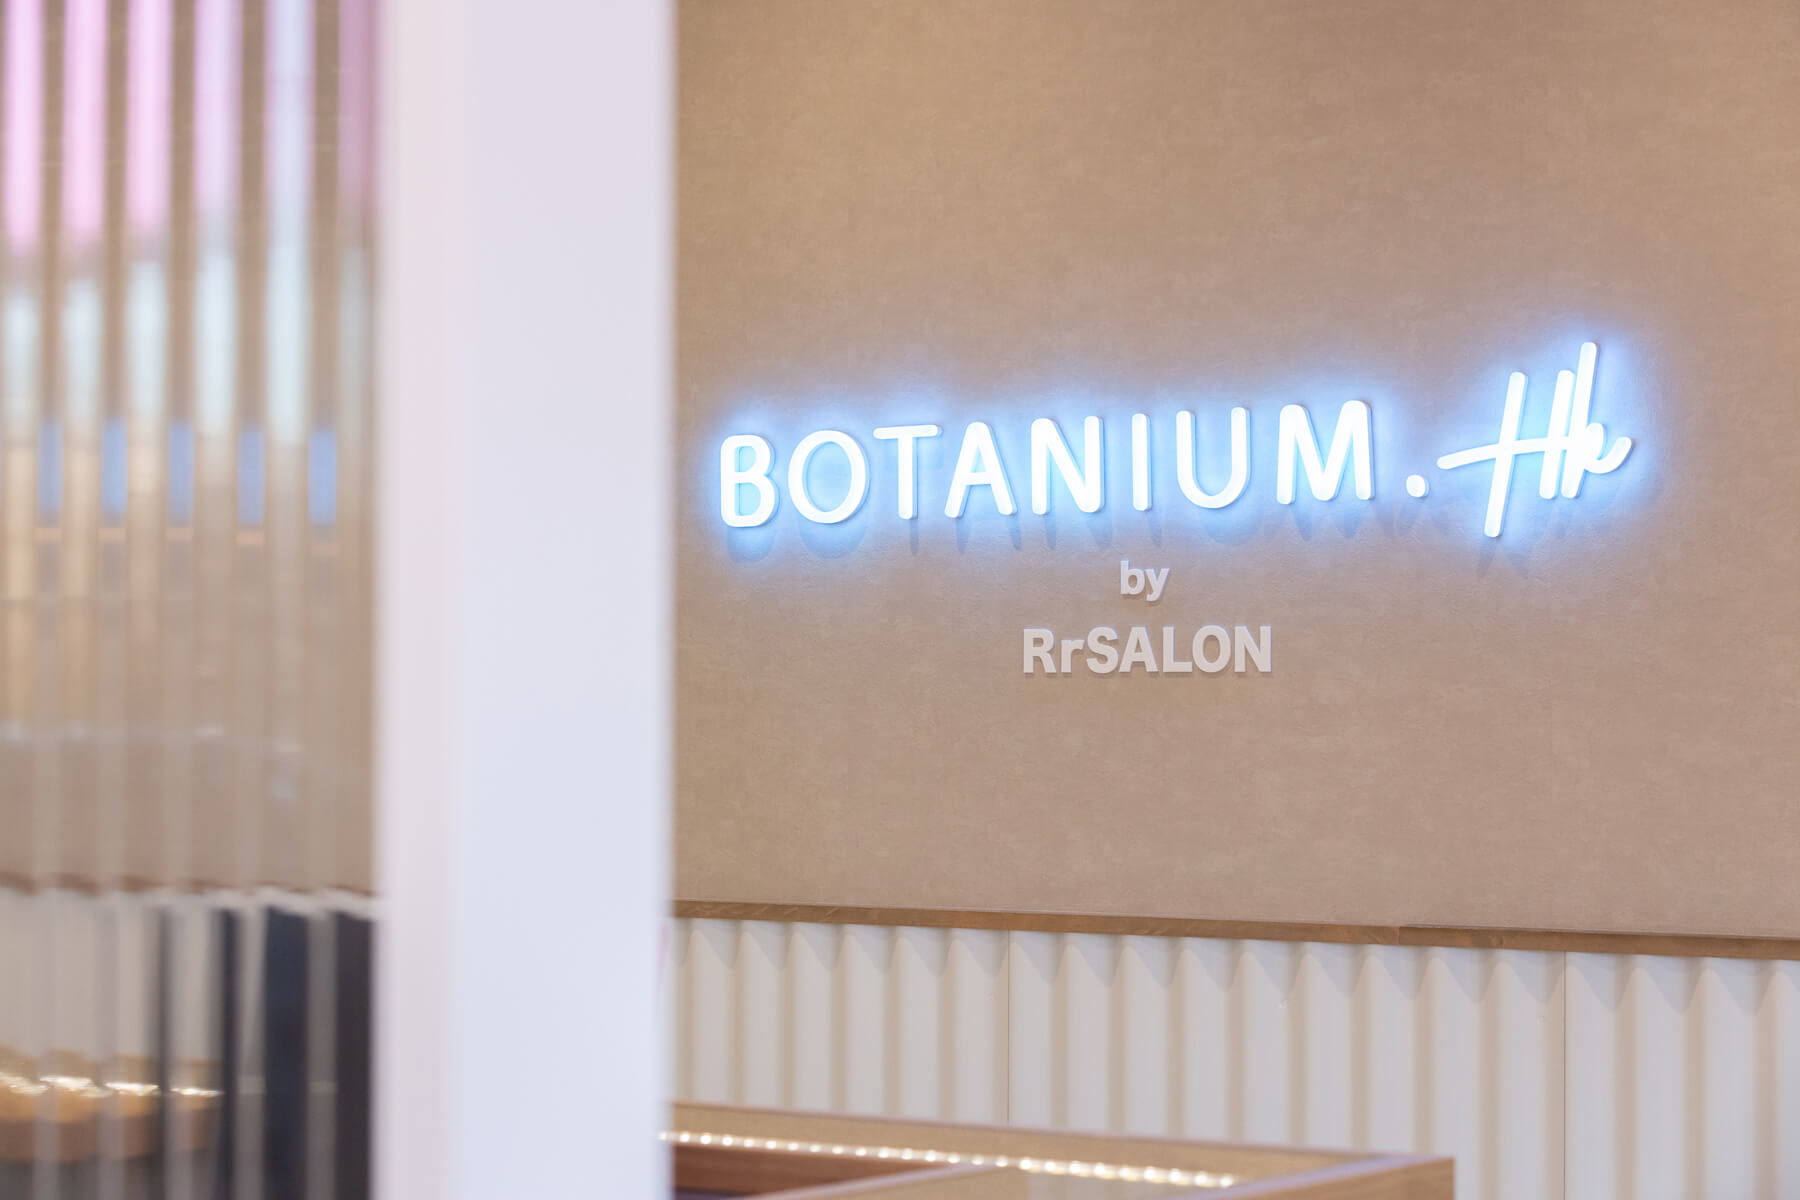 BOTANIUM.Hk by Rr SALON 東刈谷/Aichi